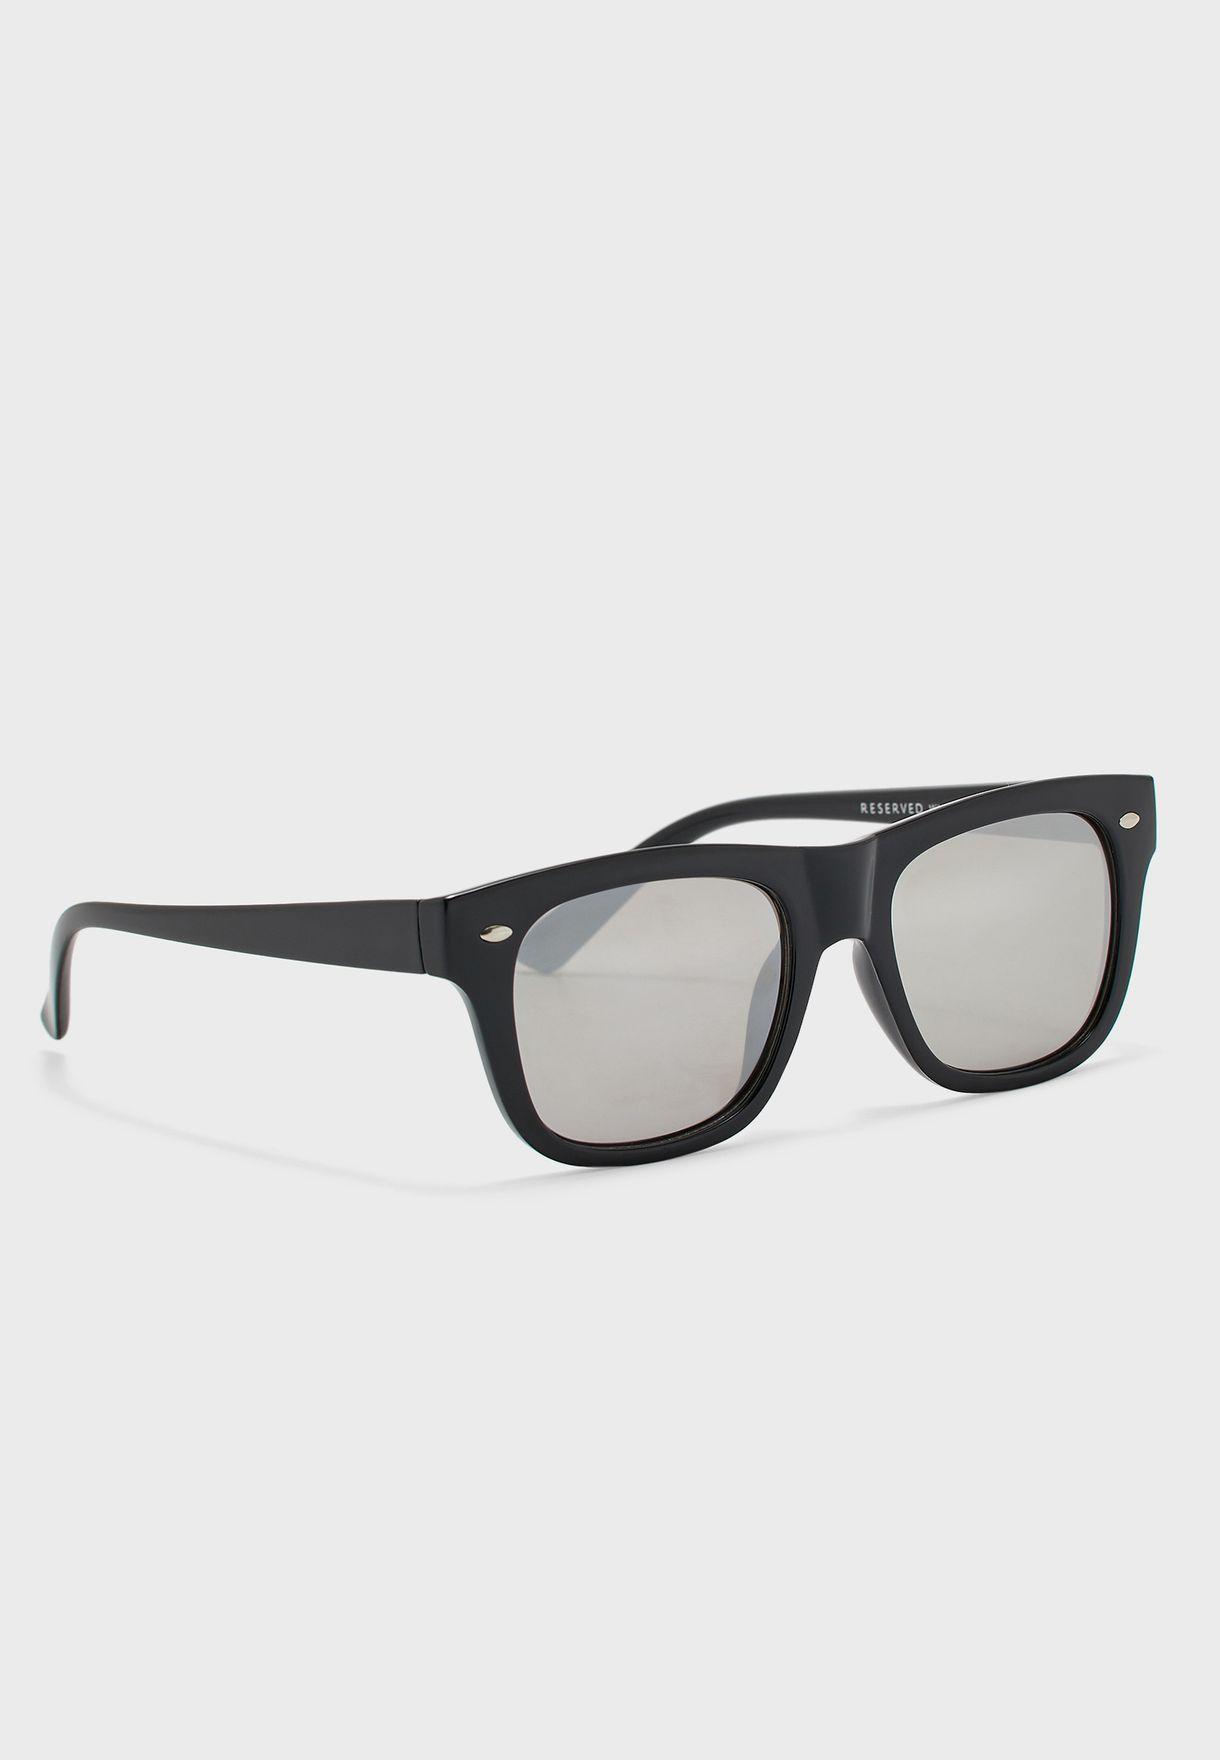 Squared Off Sunglasses